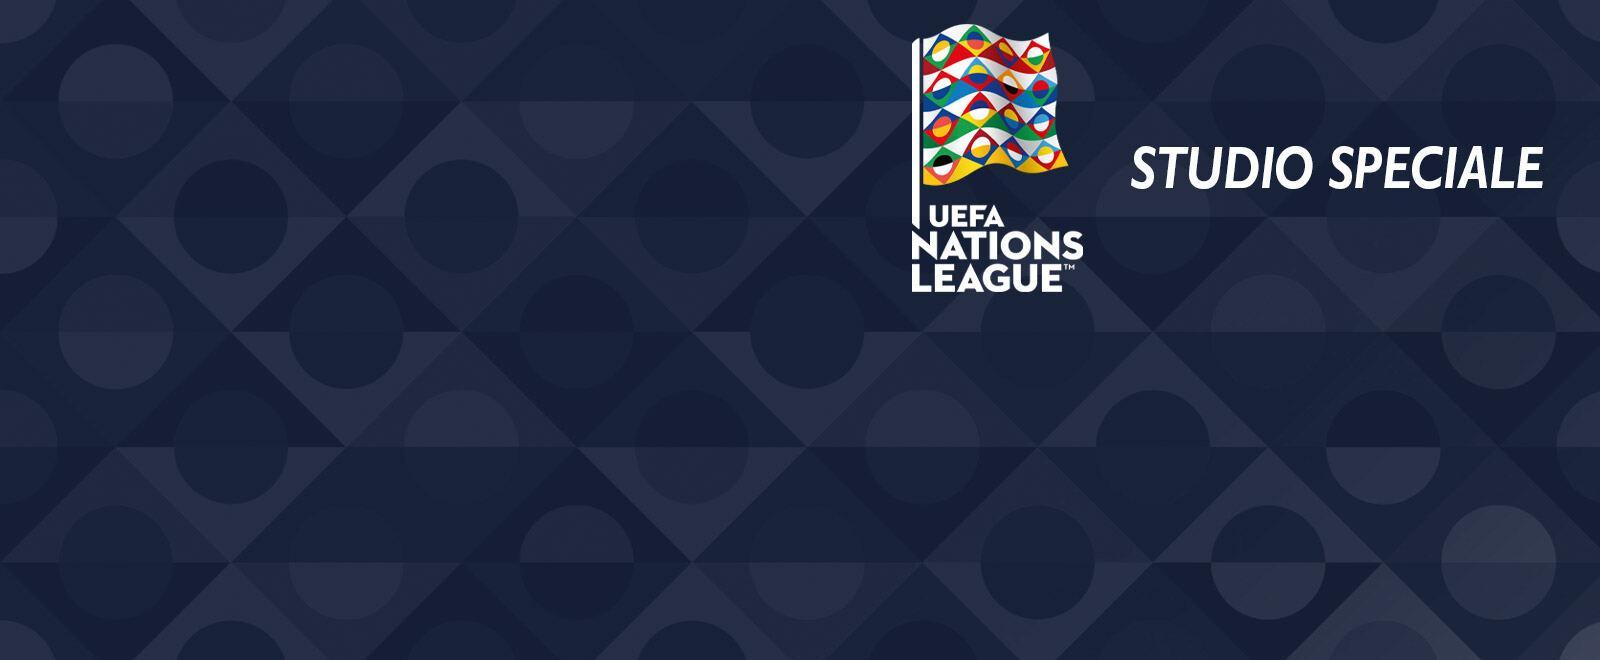 Studio speciale uefa nations league '21